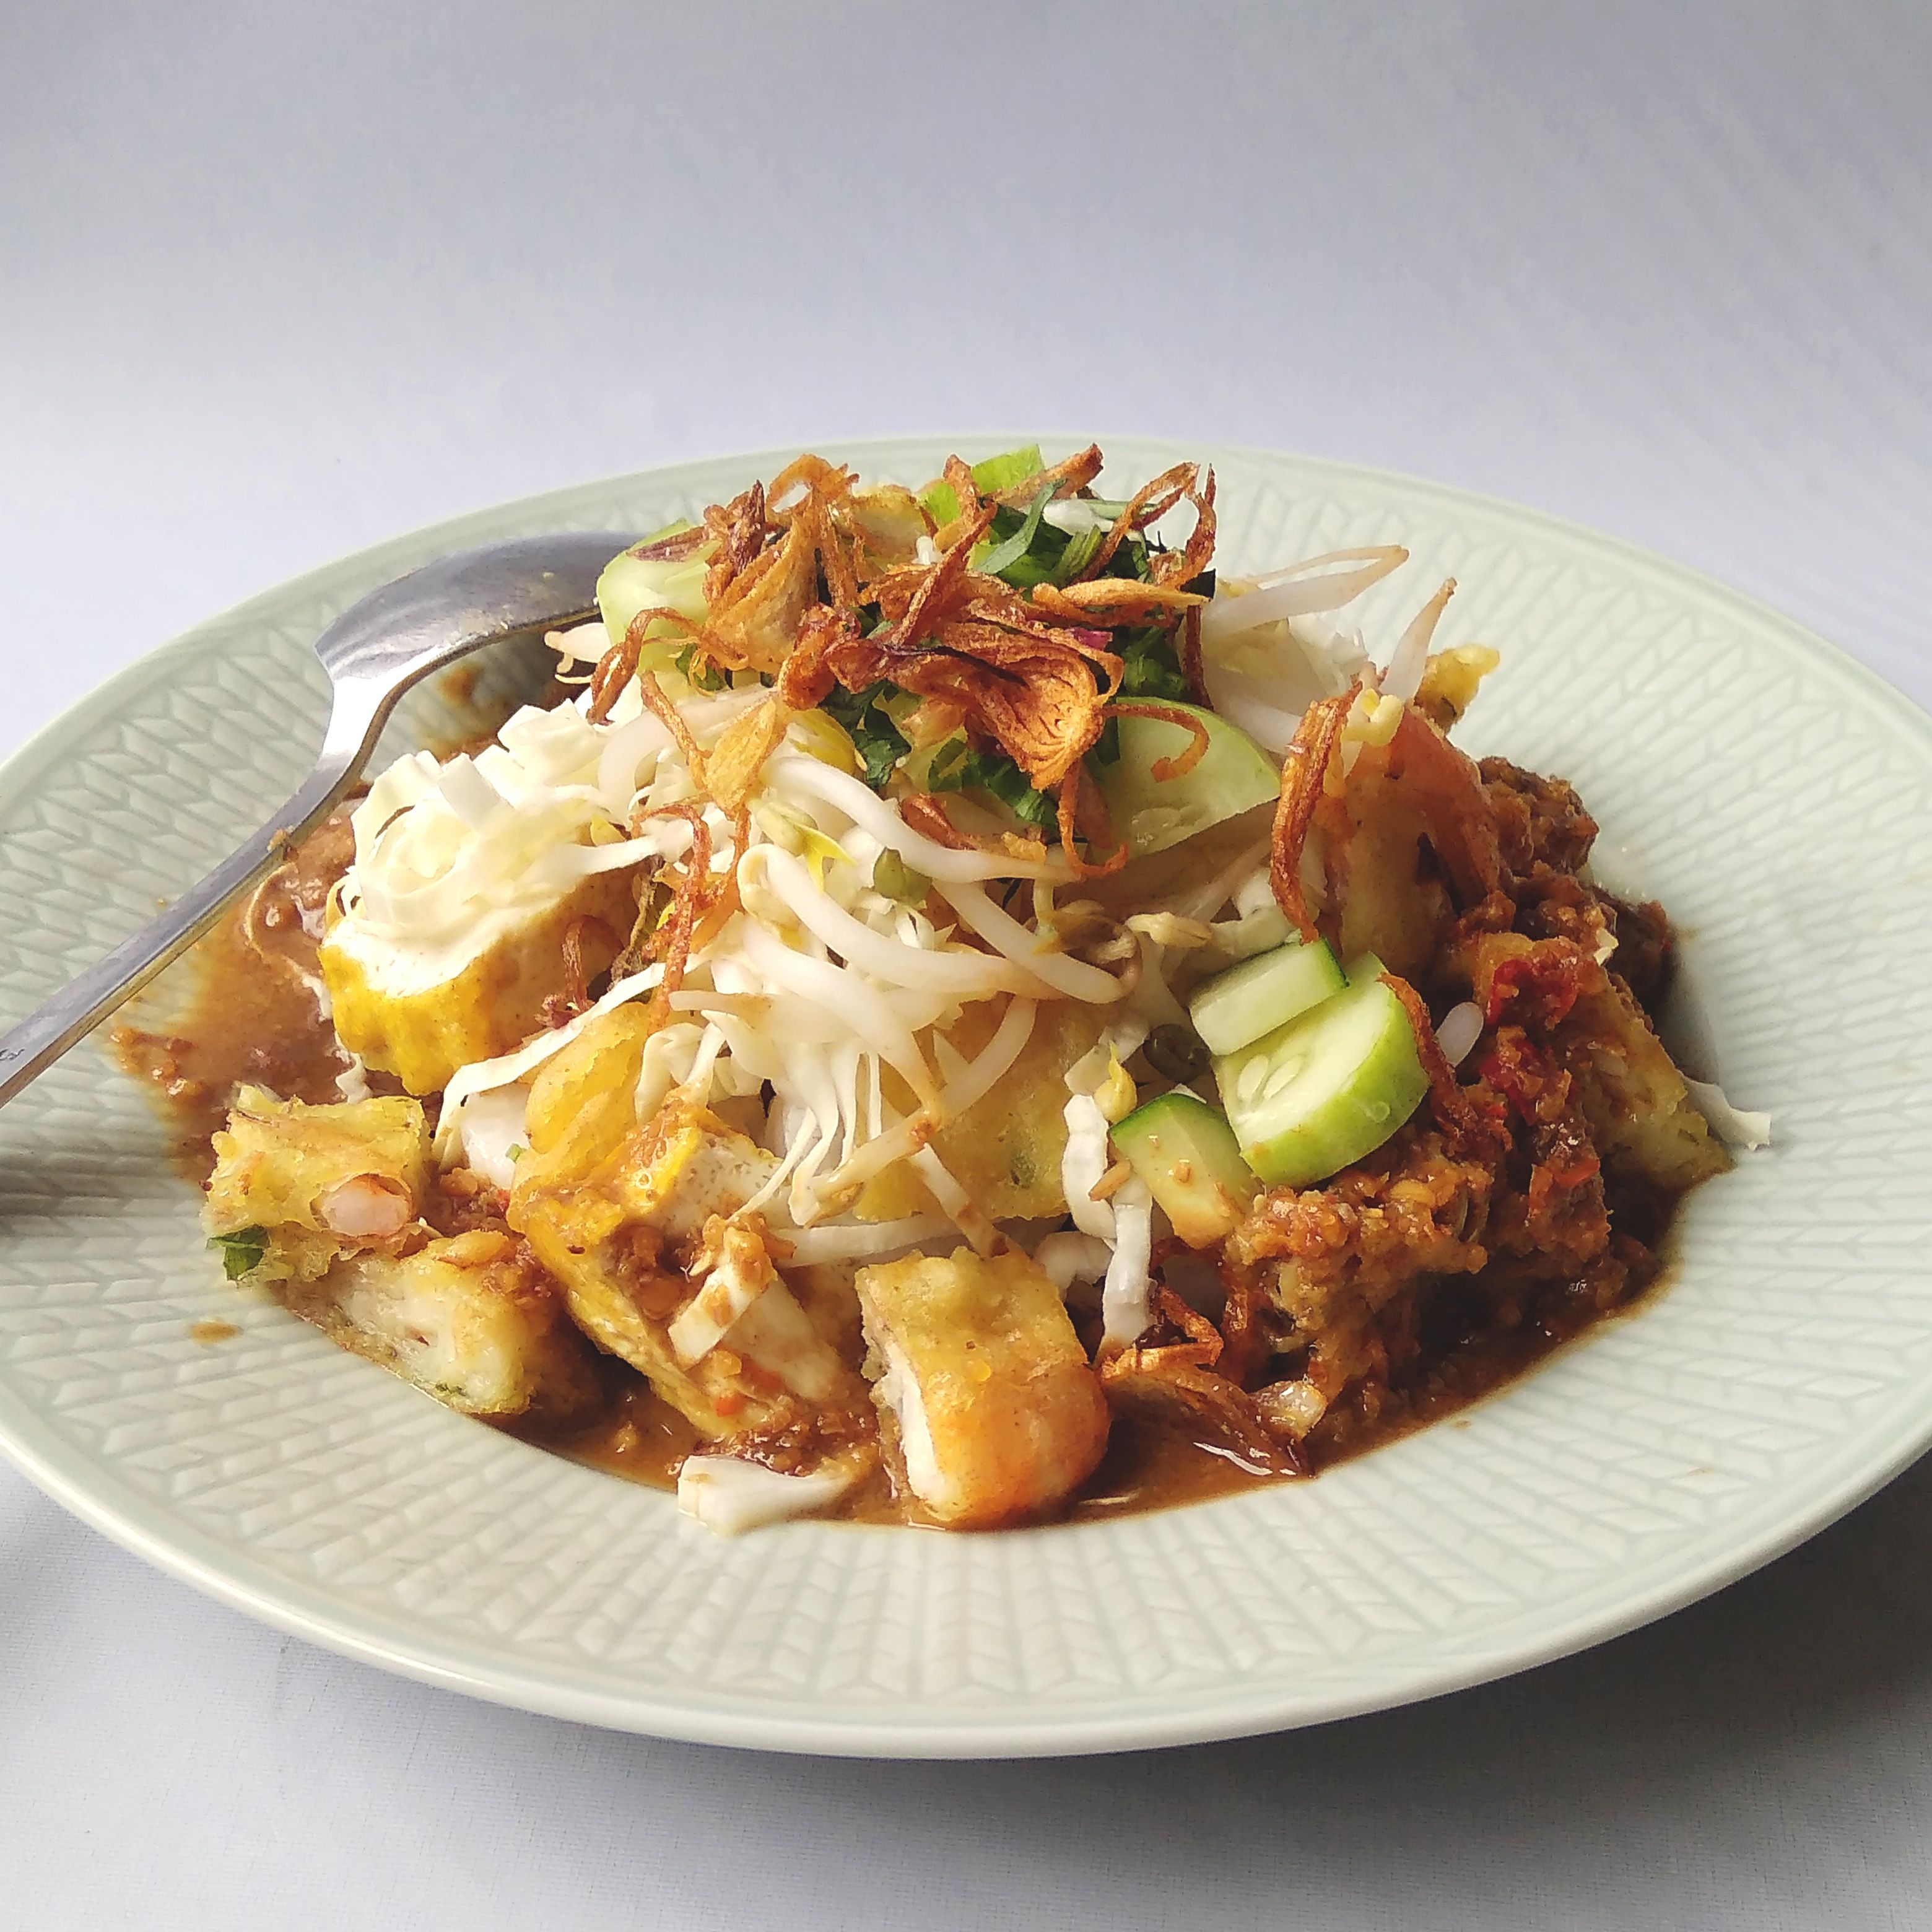 Resep Tahu Gimbal Resep Resep Tahu Resep Seafood Makanan